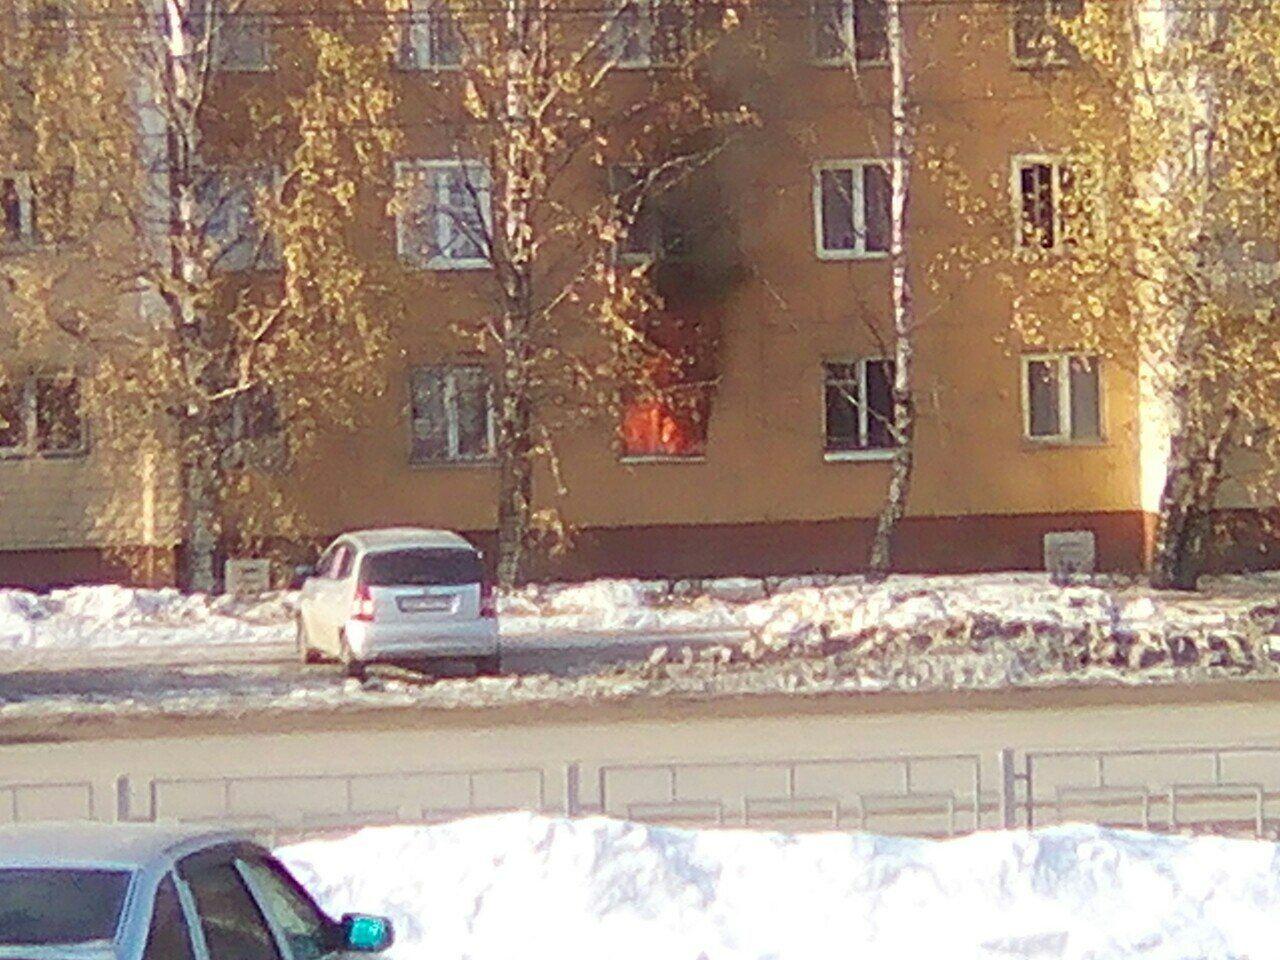 Катастрофа вКузбассе: впроцессе пожара умер 3-летний ребенок